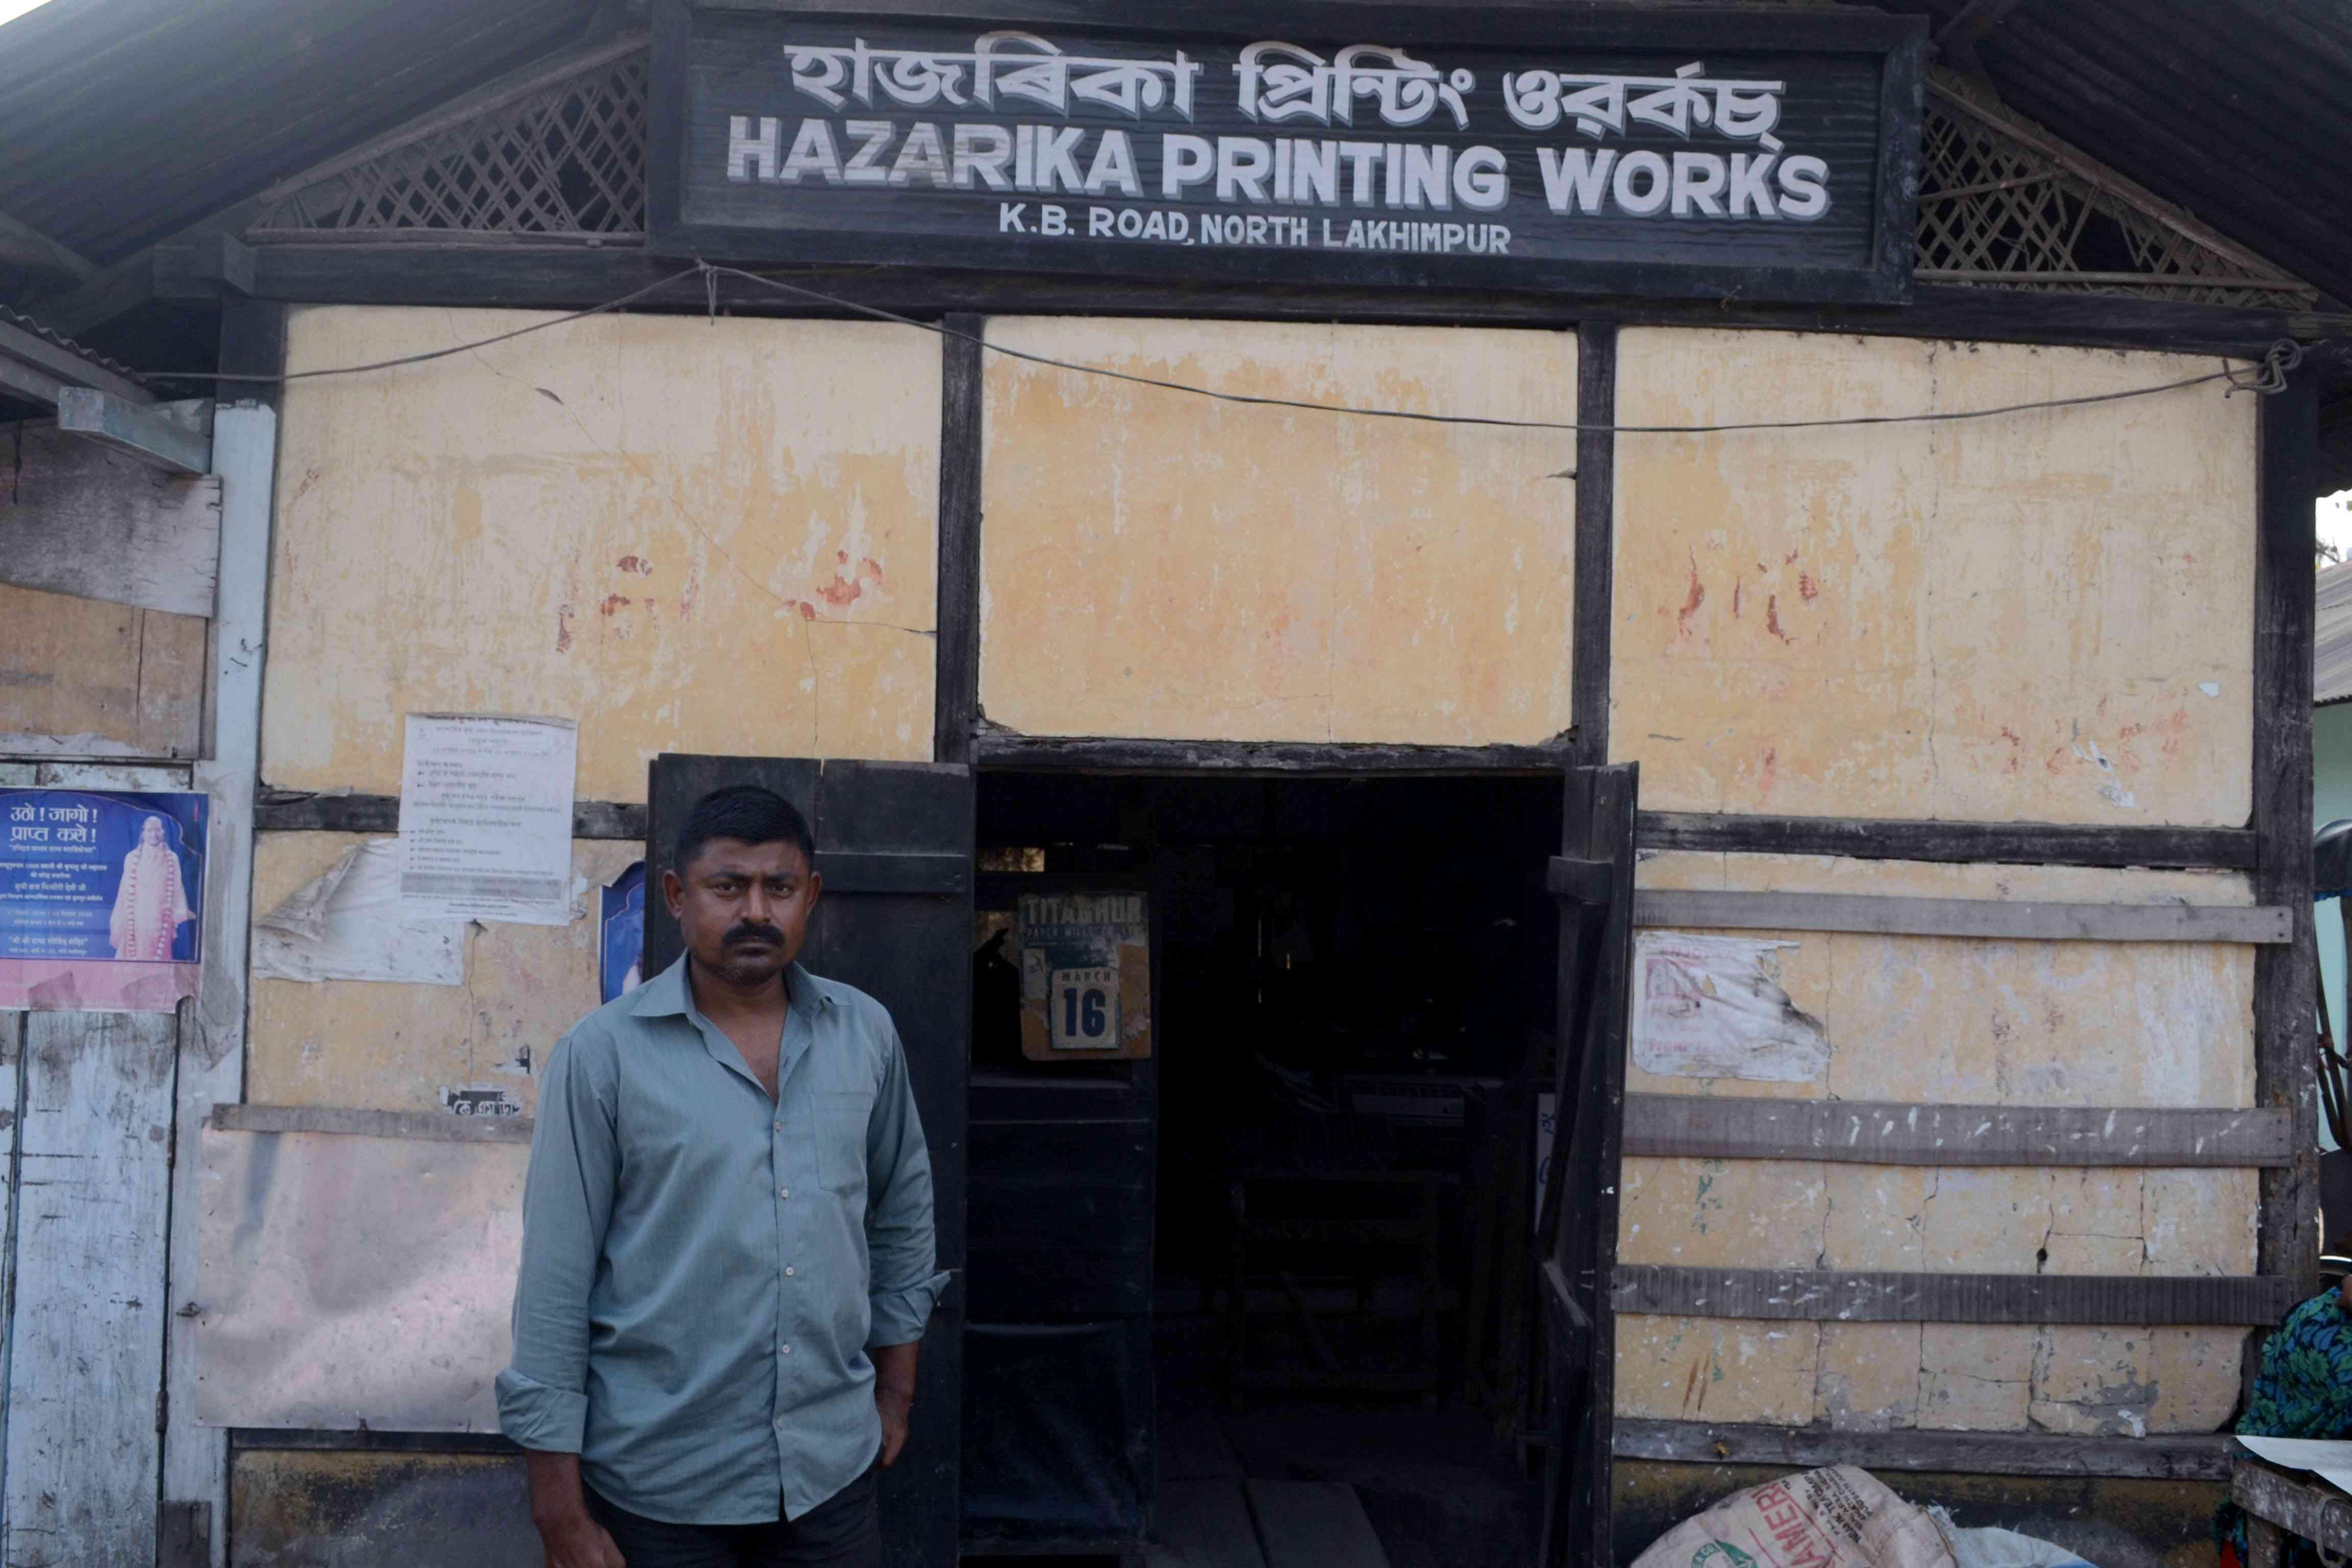 Mohammad Atiqur Rahman says statements by some BJP leaders have hurt Upper Assam's Muslims. Photo credit: Arunabh Saikia